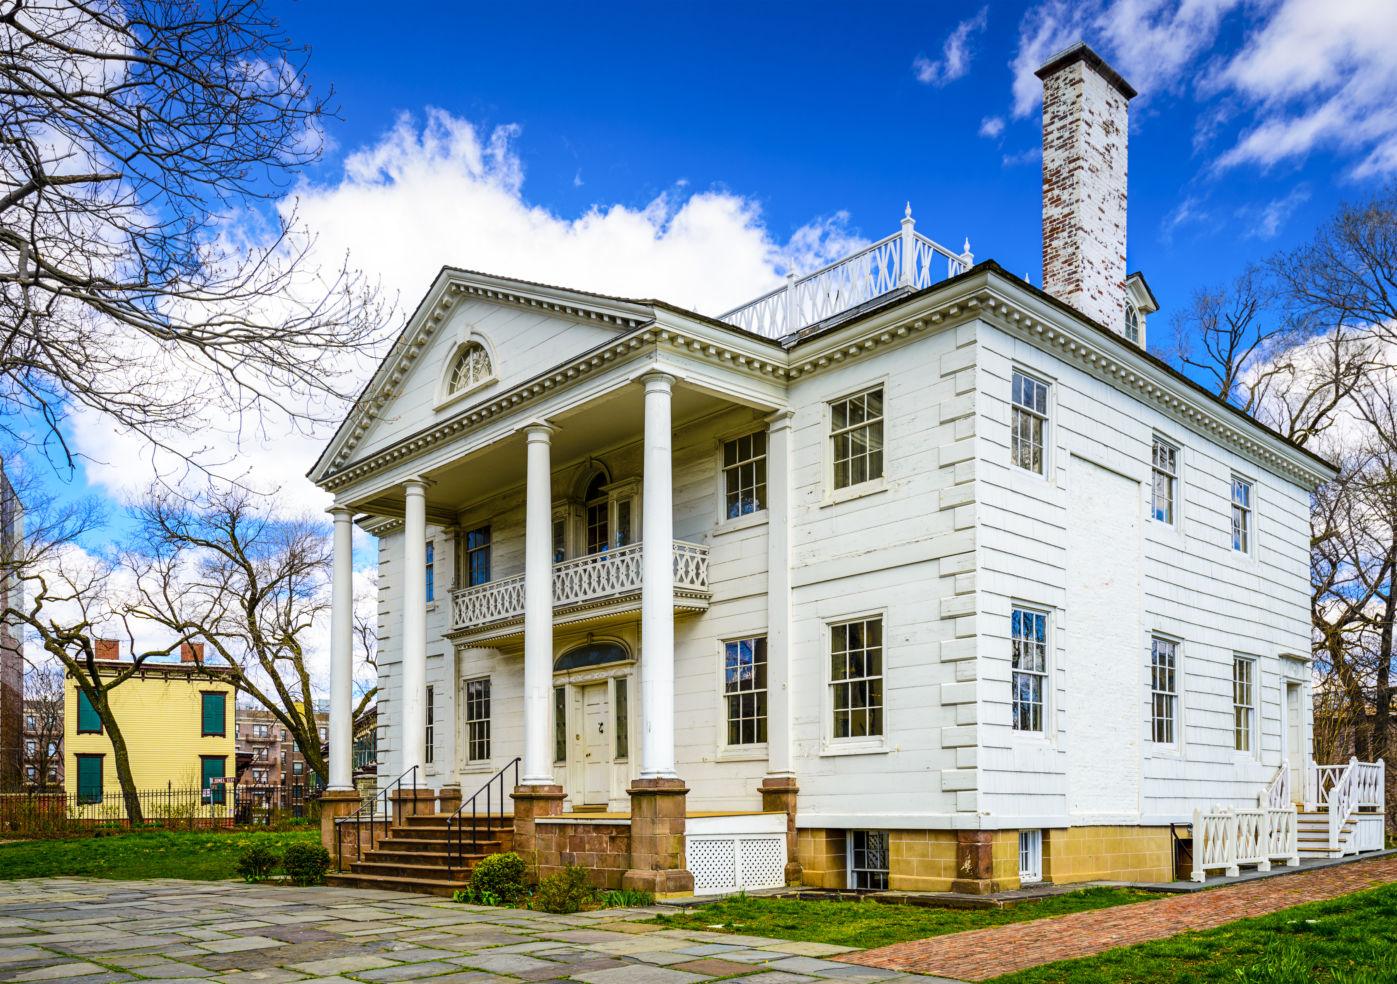 Morris-Jumel Mansion, Washington Heights New York City